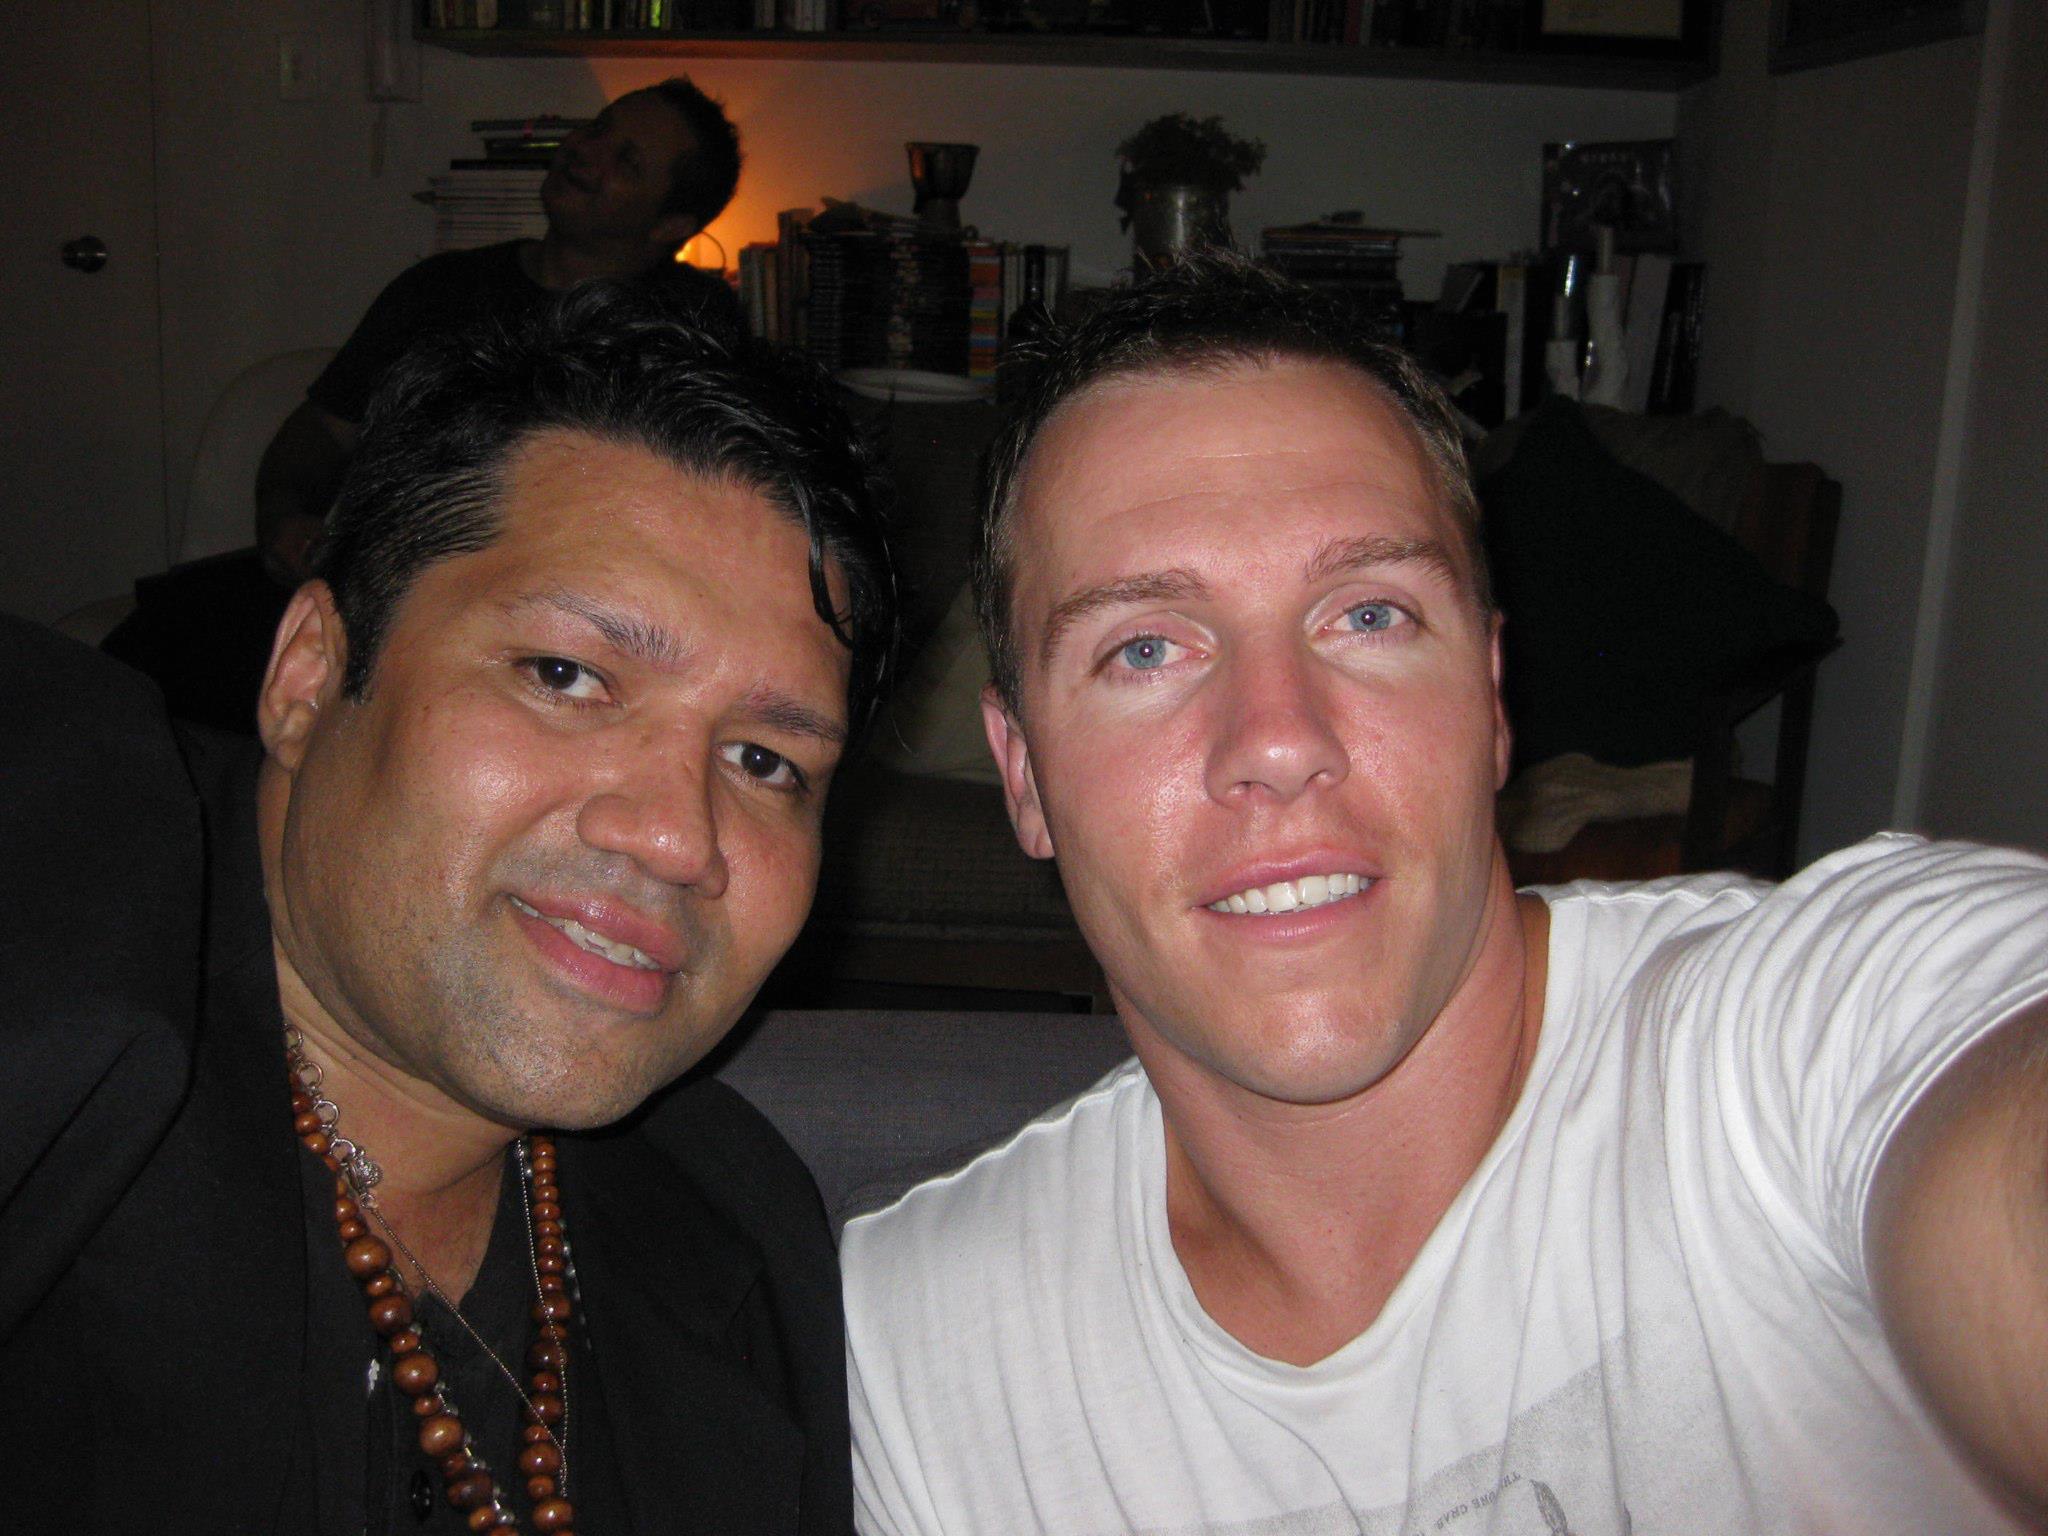 Shaun and I at my birthday party February 2011